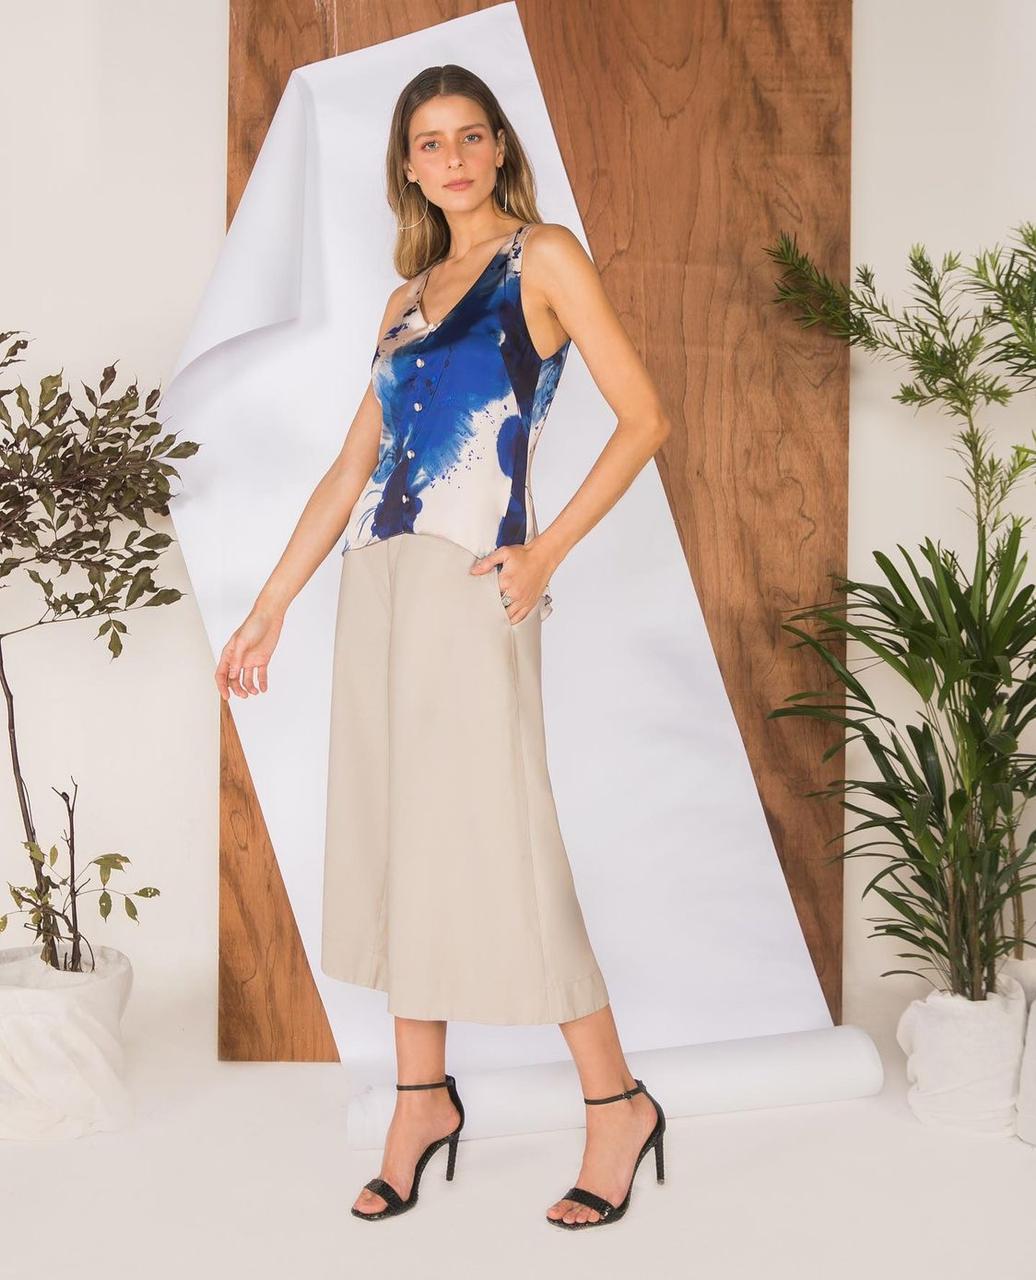 Blusa Regata Mauy multi estampa floral